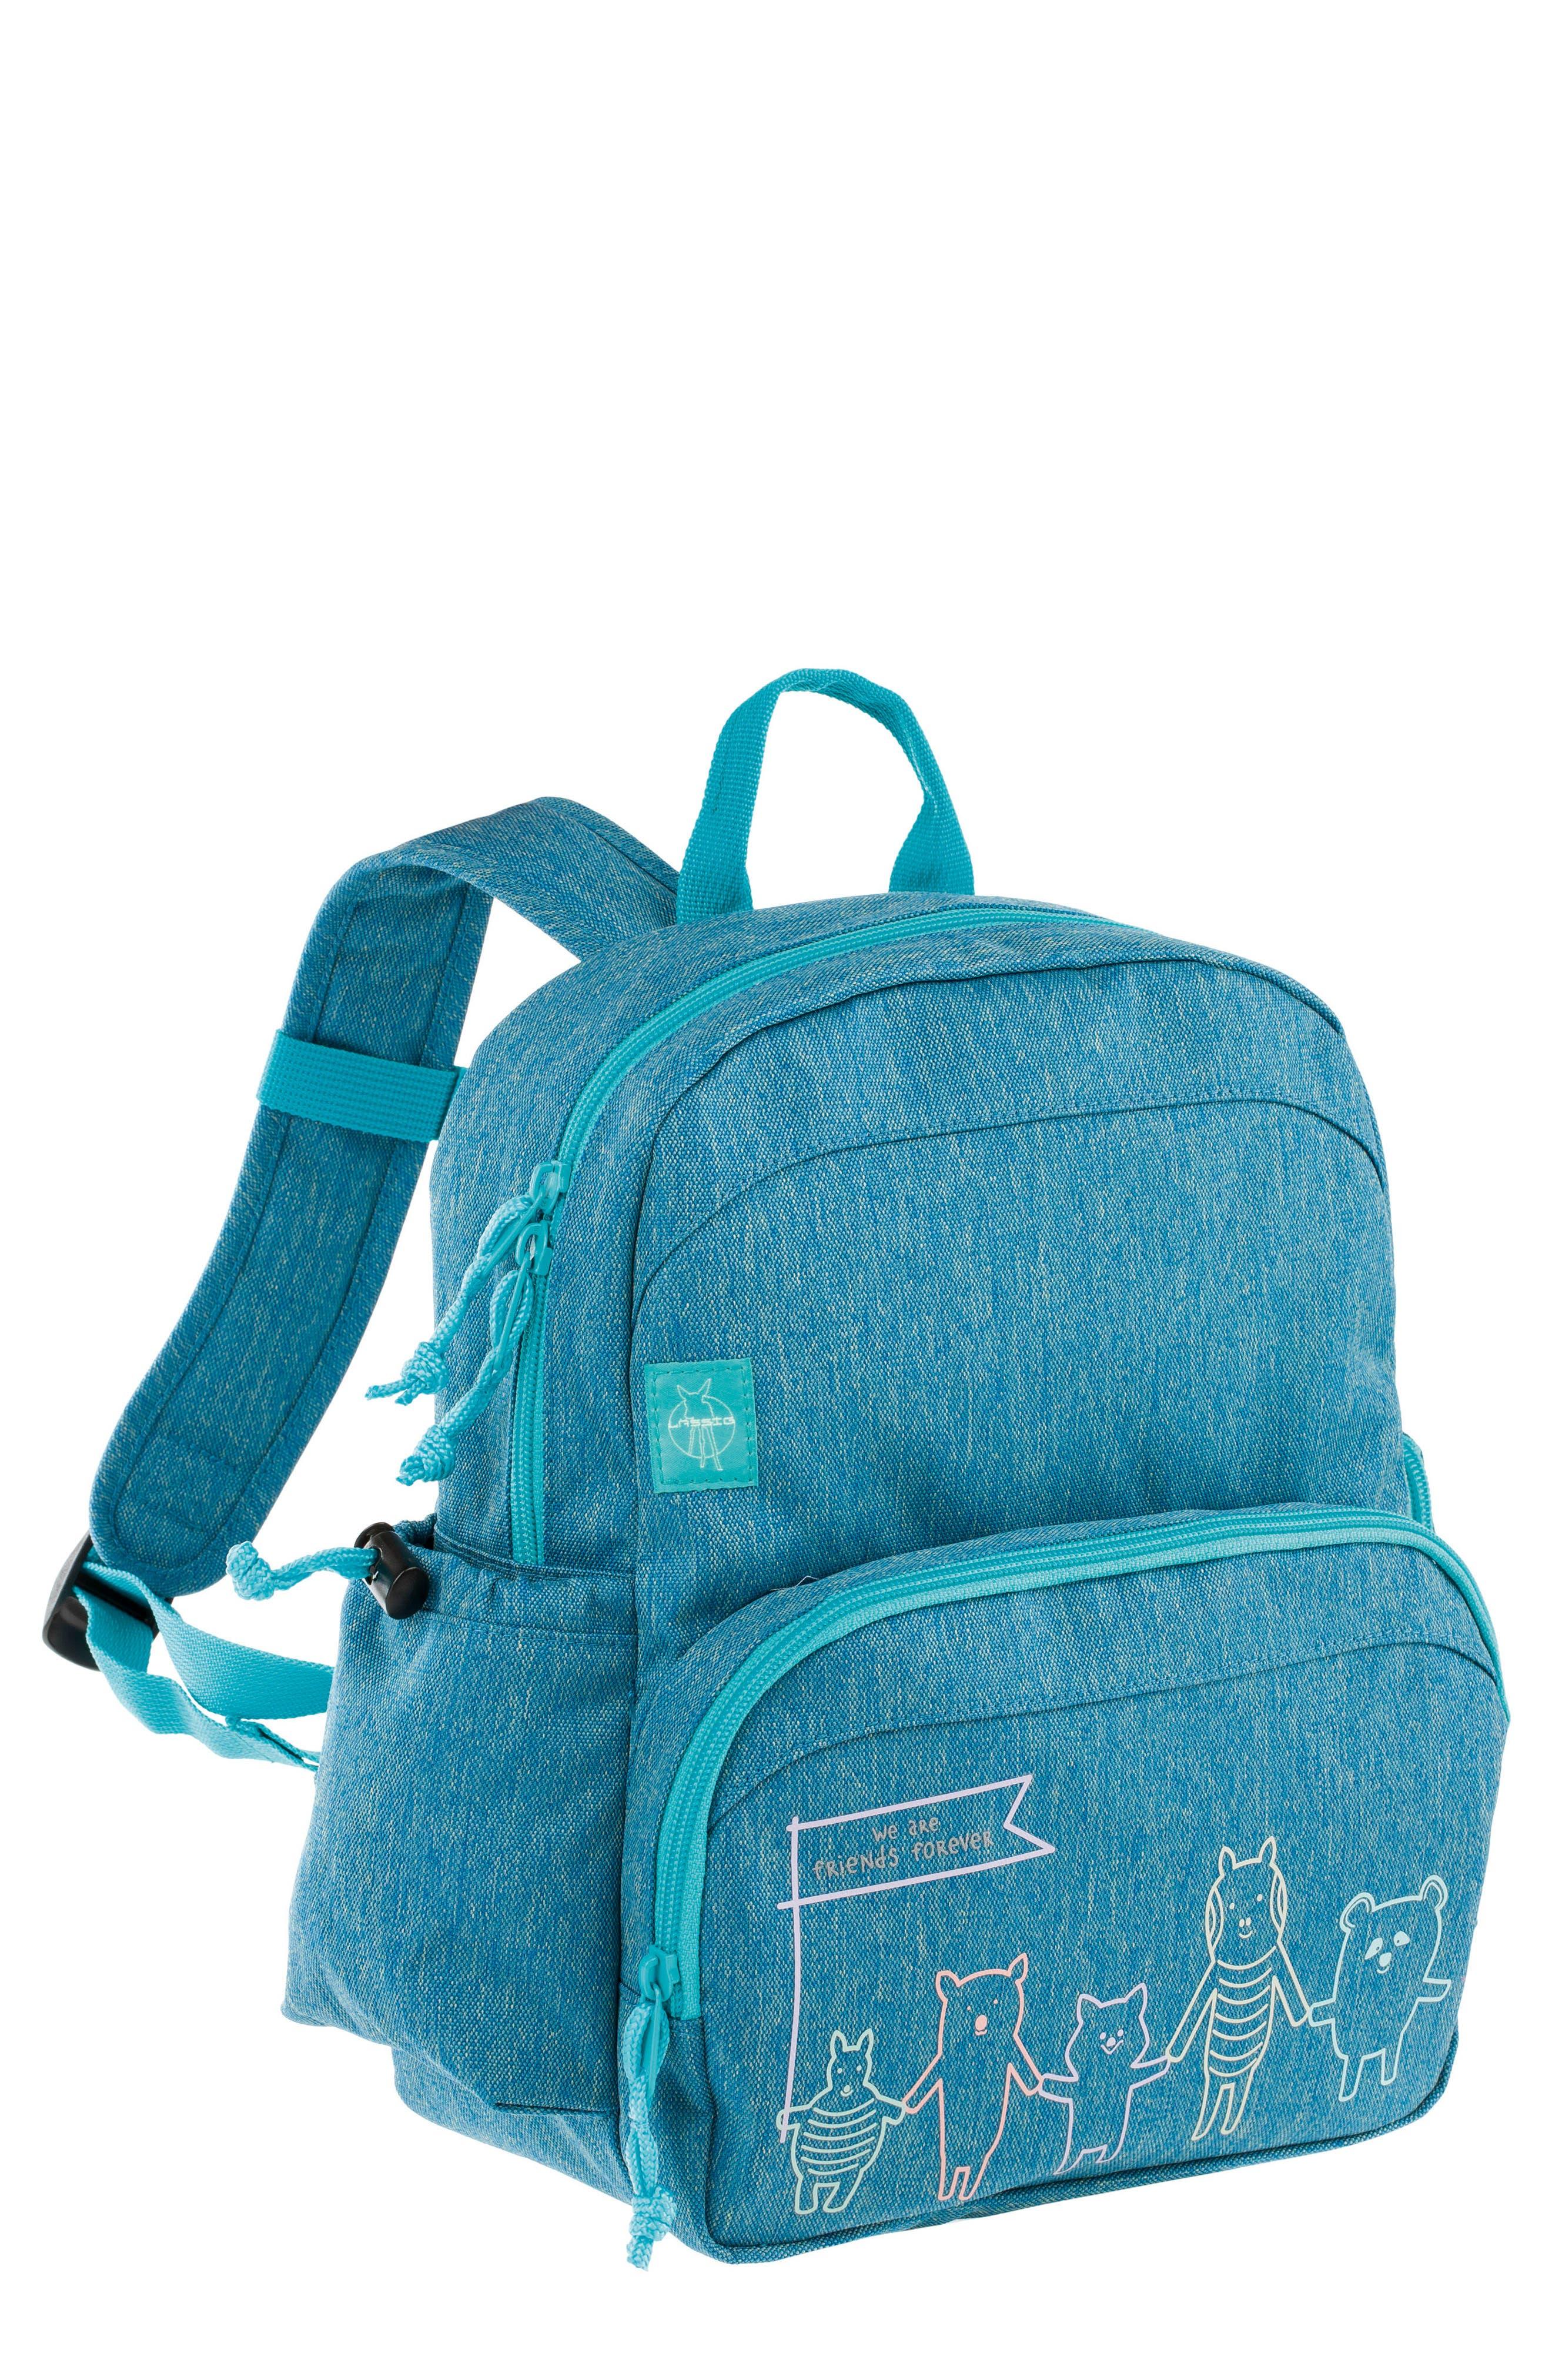 Medium About Friends Backpack,                             Main thumbnail 1, color,                             Melange Blue